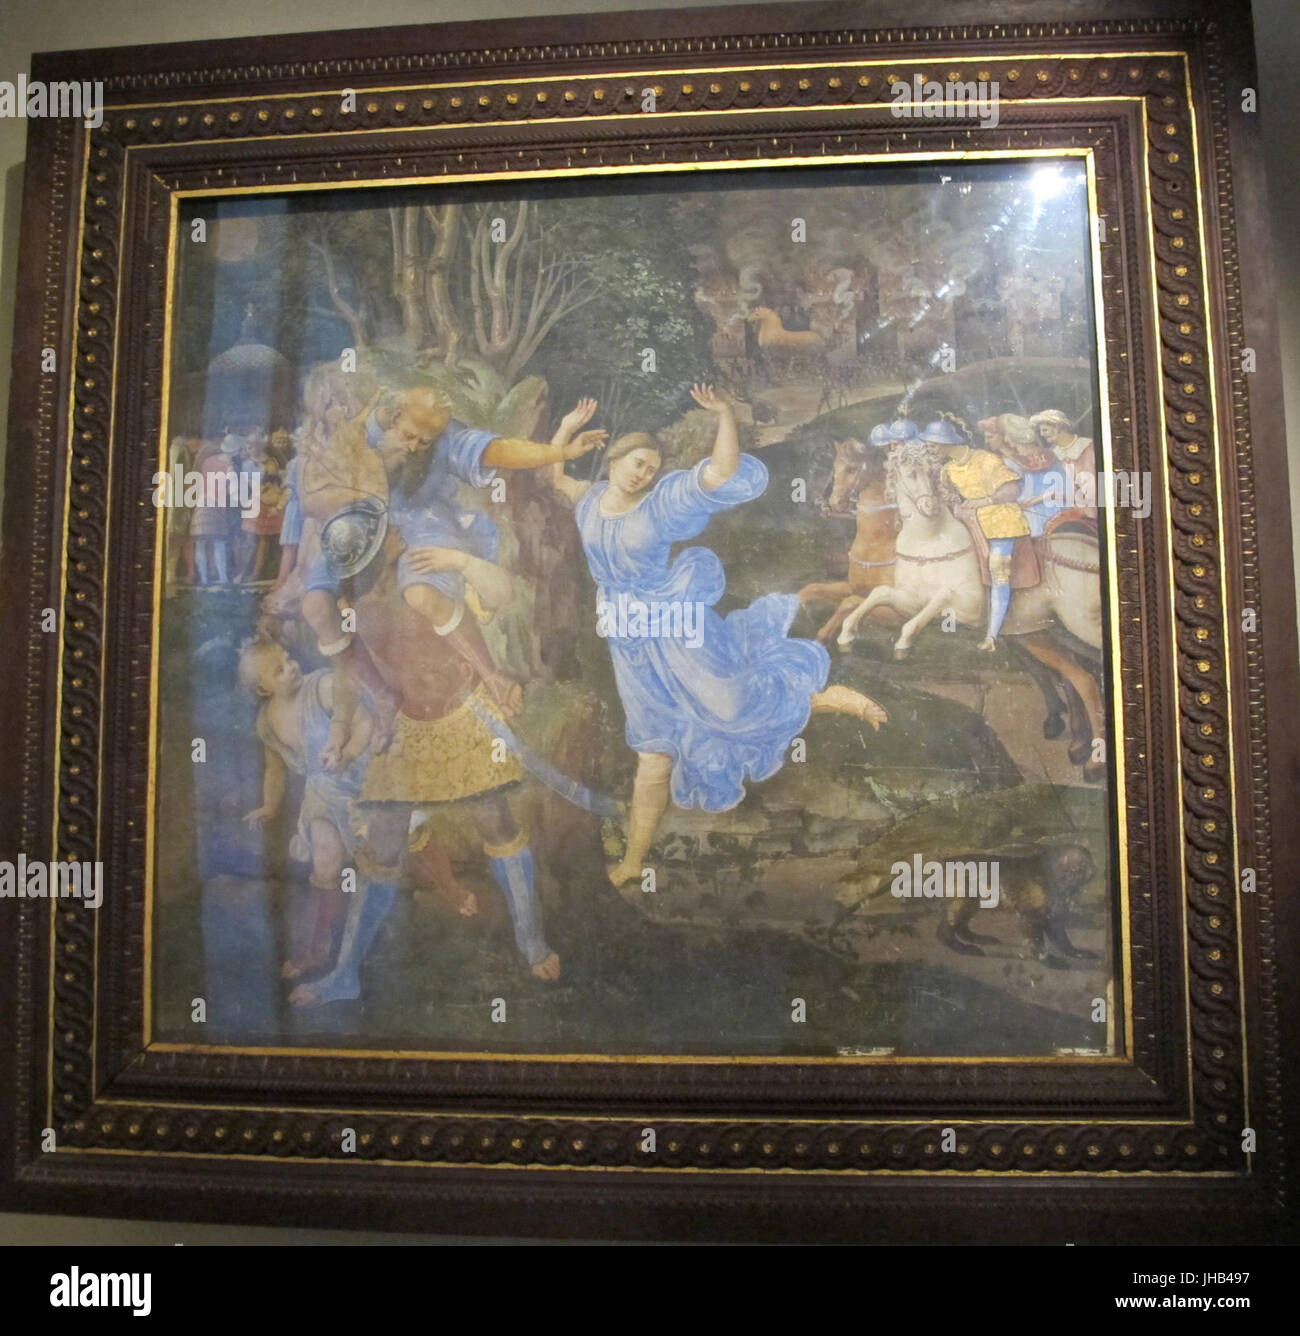 Girolamo genga, fuga da troiai, 1508-09, dal palazzo del magnifico petrucci 01 - Stock Image